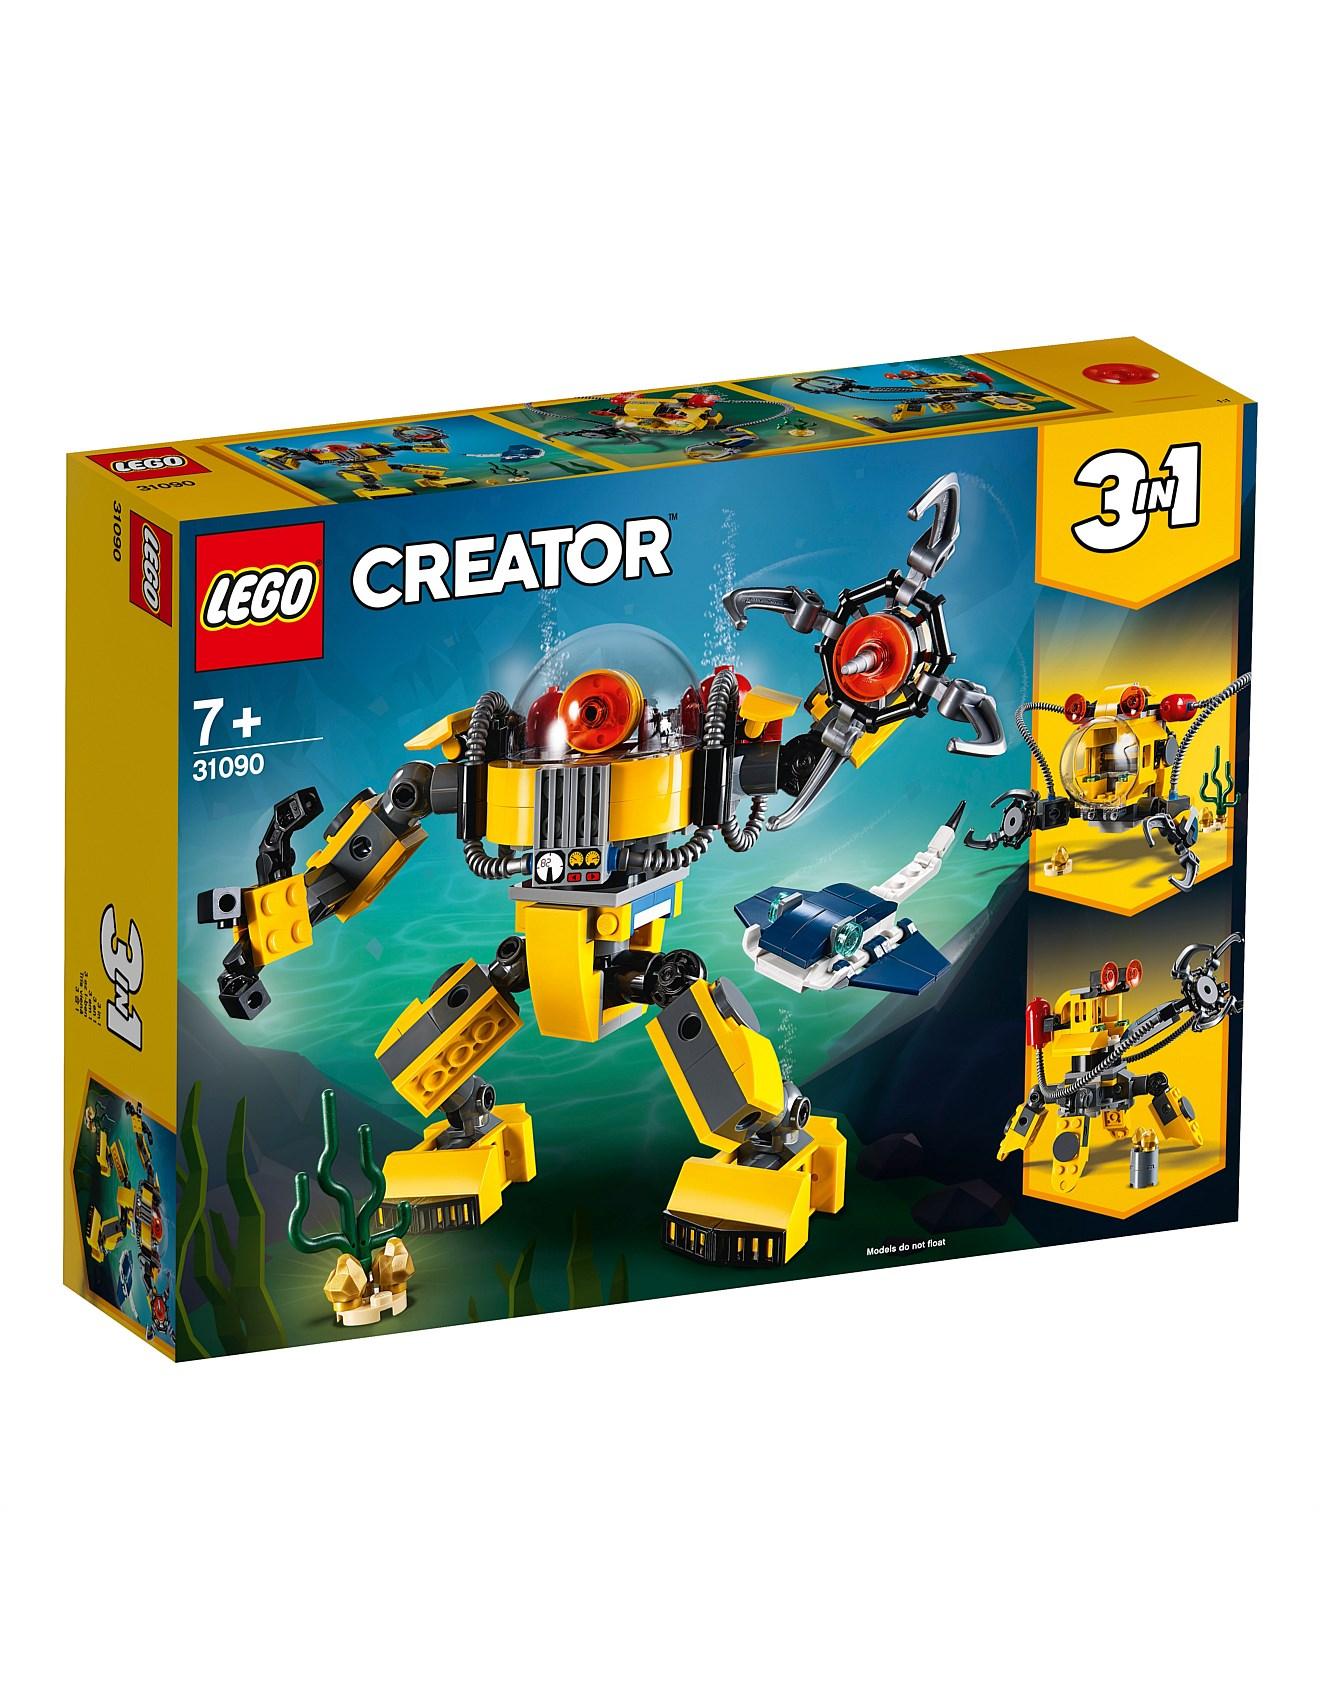 LEGO| Buy LEGO Products Online | David Jones - LEGO Creator